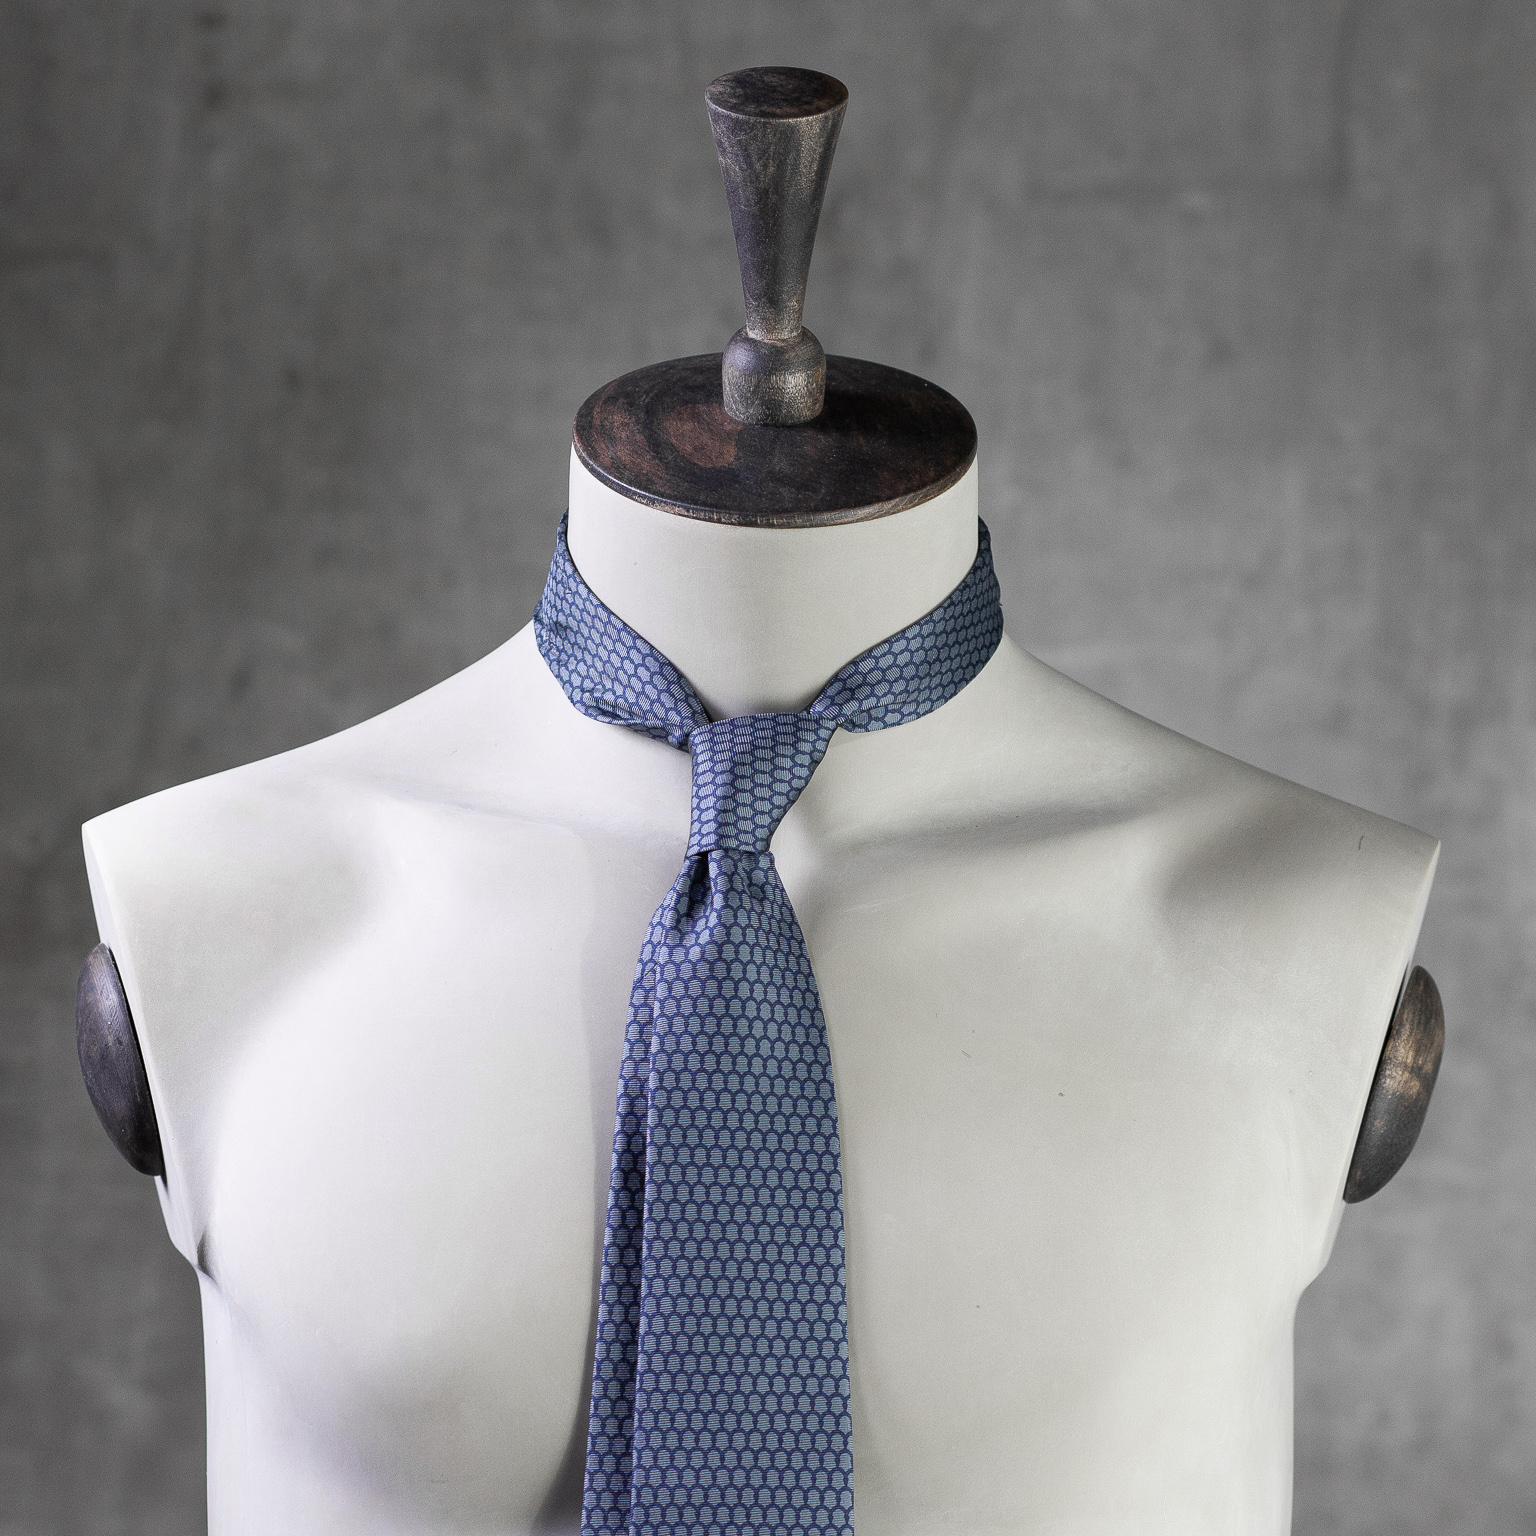 PRINTED-SILK-SEDA-ESTAMPADA-0585-Tie-Initials-Corbata-Iniciales-The-Seelk-2